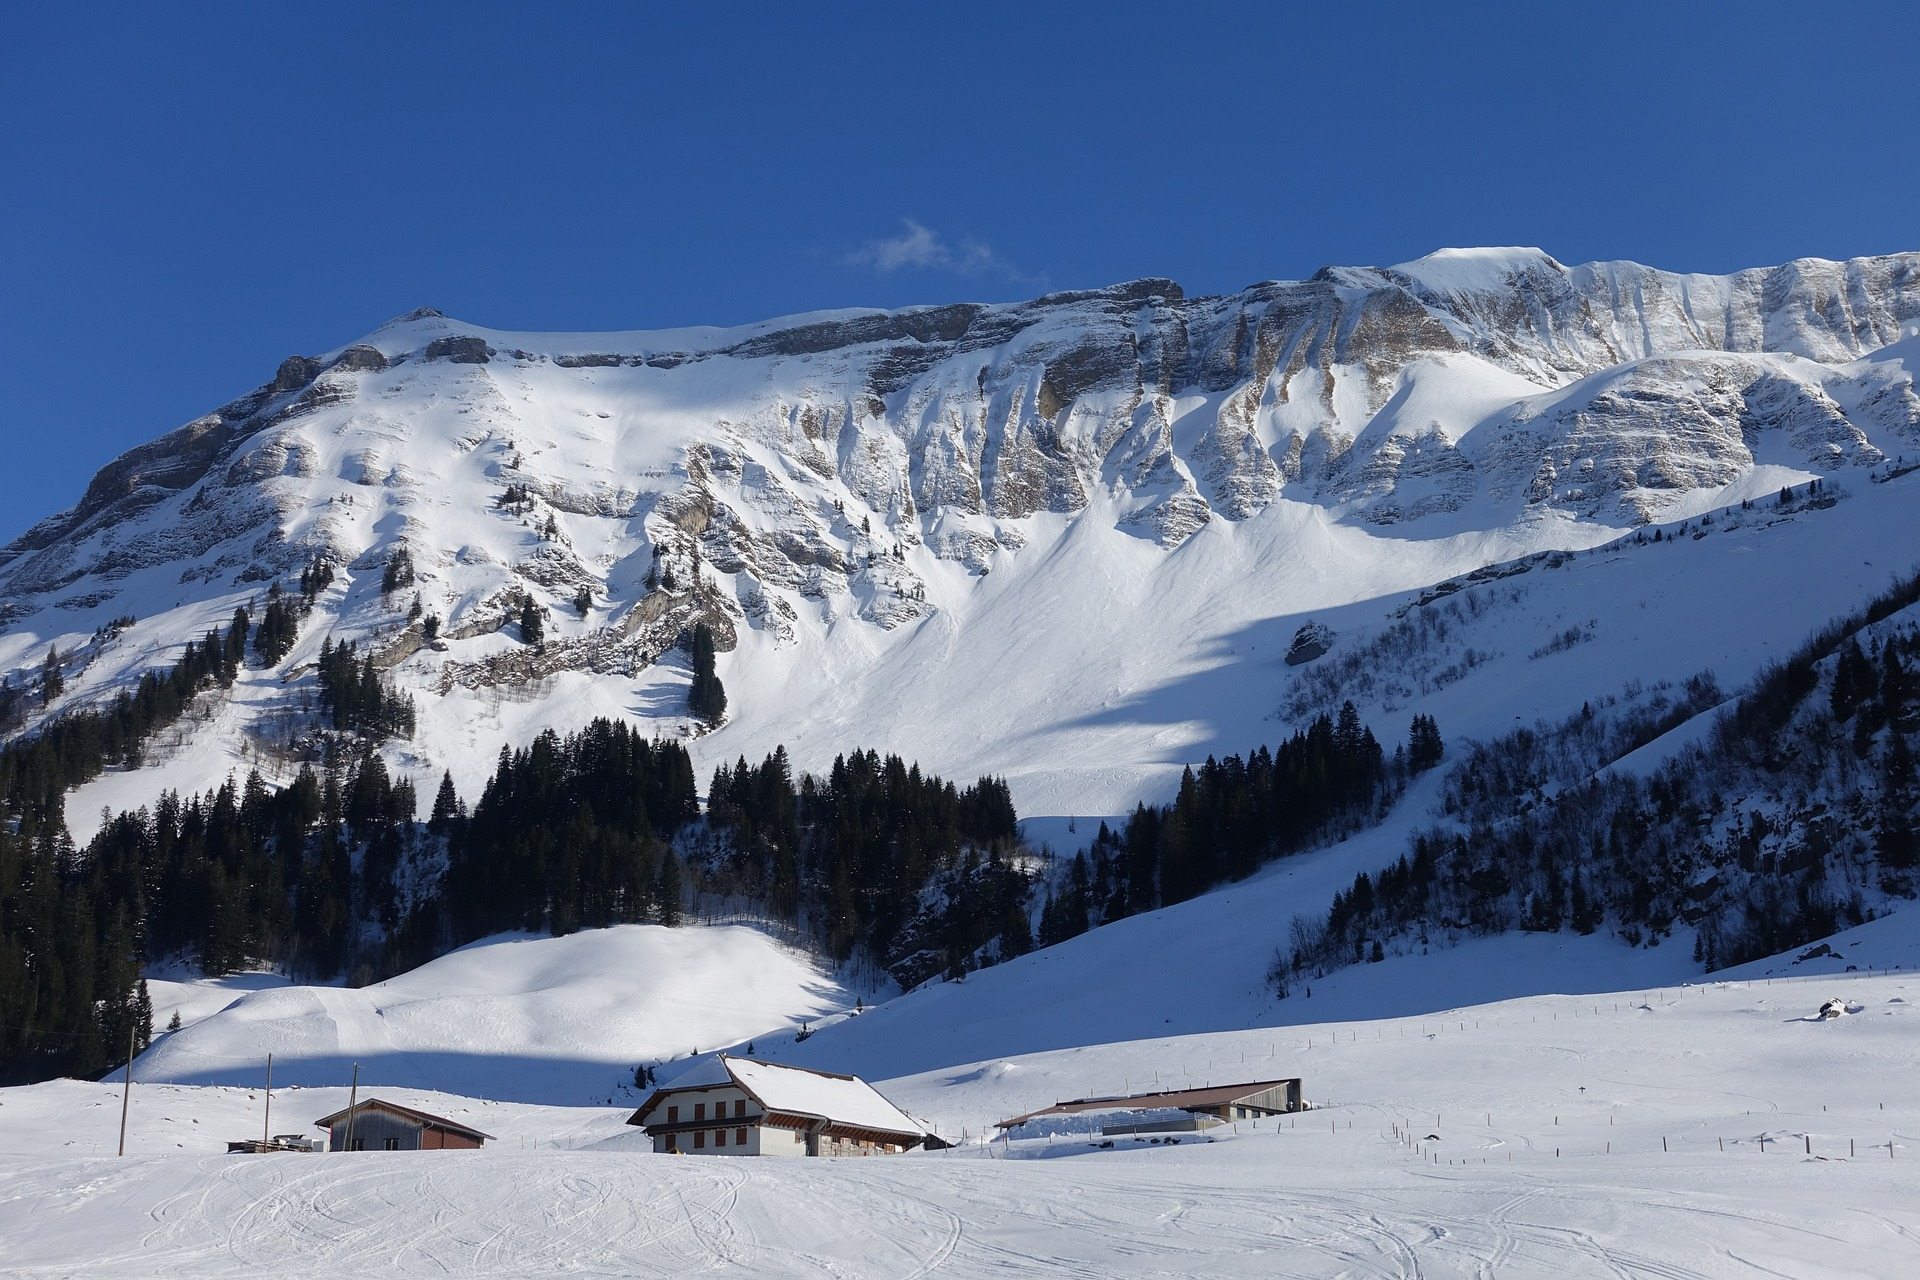 Jungfrau - 10 Top Ski Resorts in Switzerland